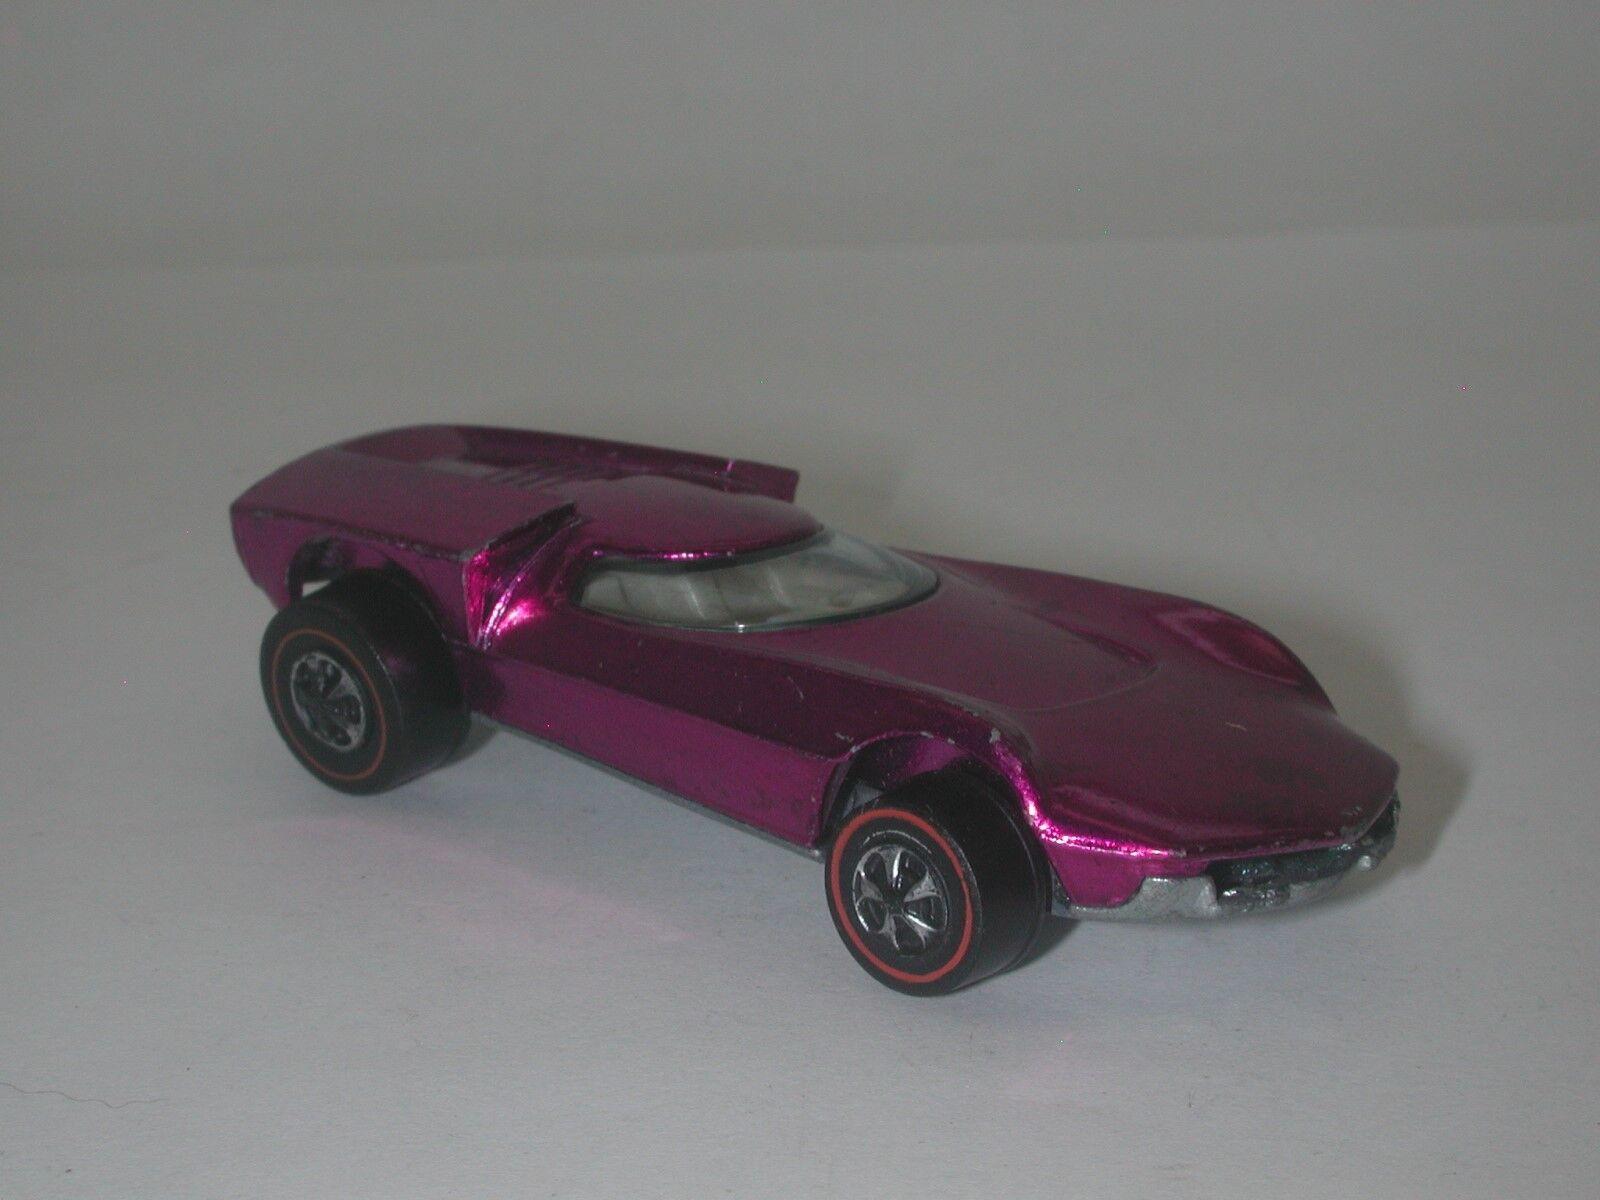 Redline Hotwheels Magenta 1969 Turbofire oc17775